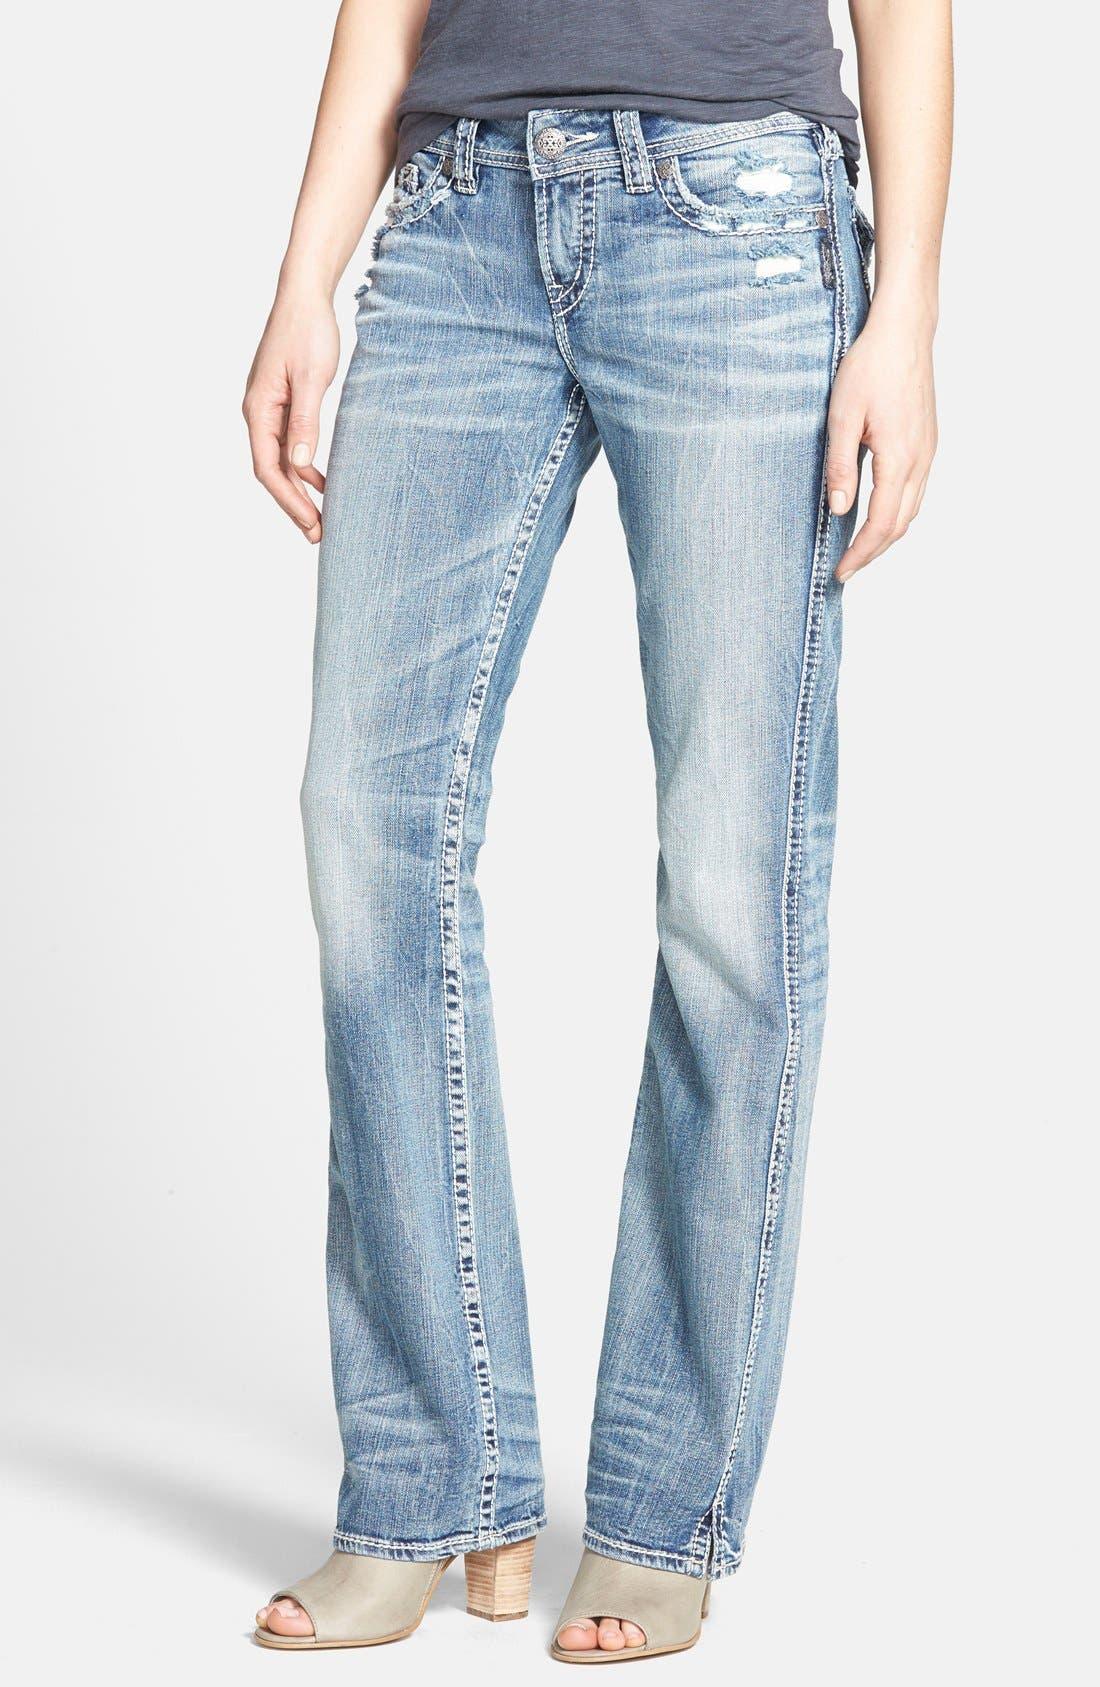 Alternate Image 1 Selected - Silver Jeans Co. 'Suki' Distressed Flap Pocket Slim Bootcut Jeans (Indigo)